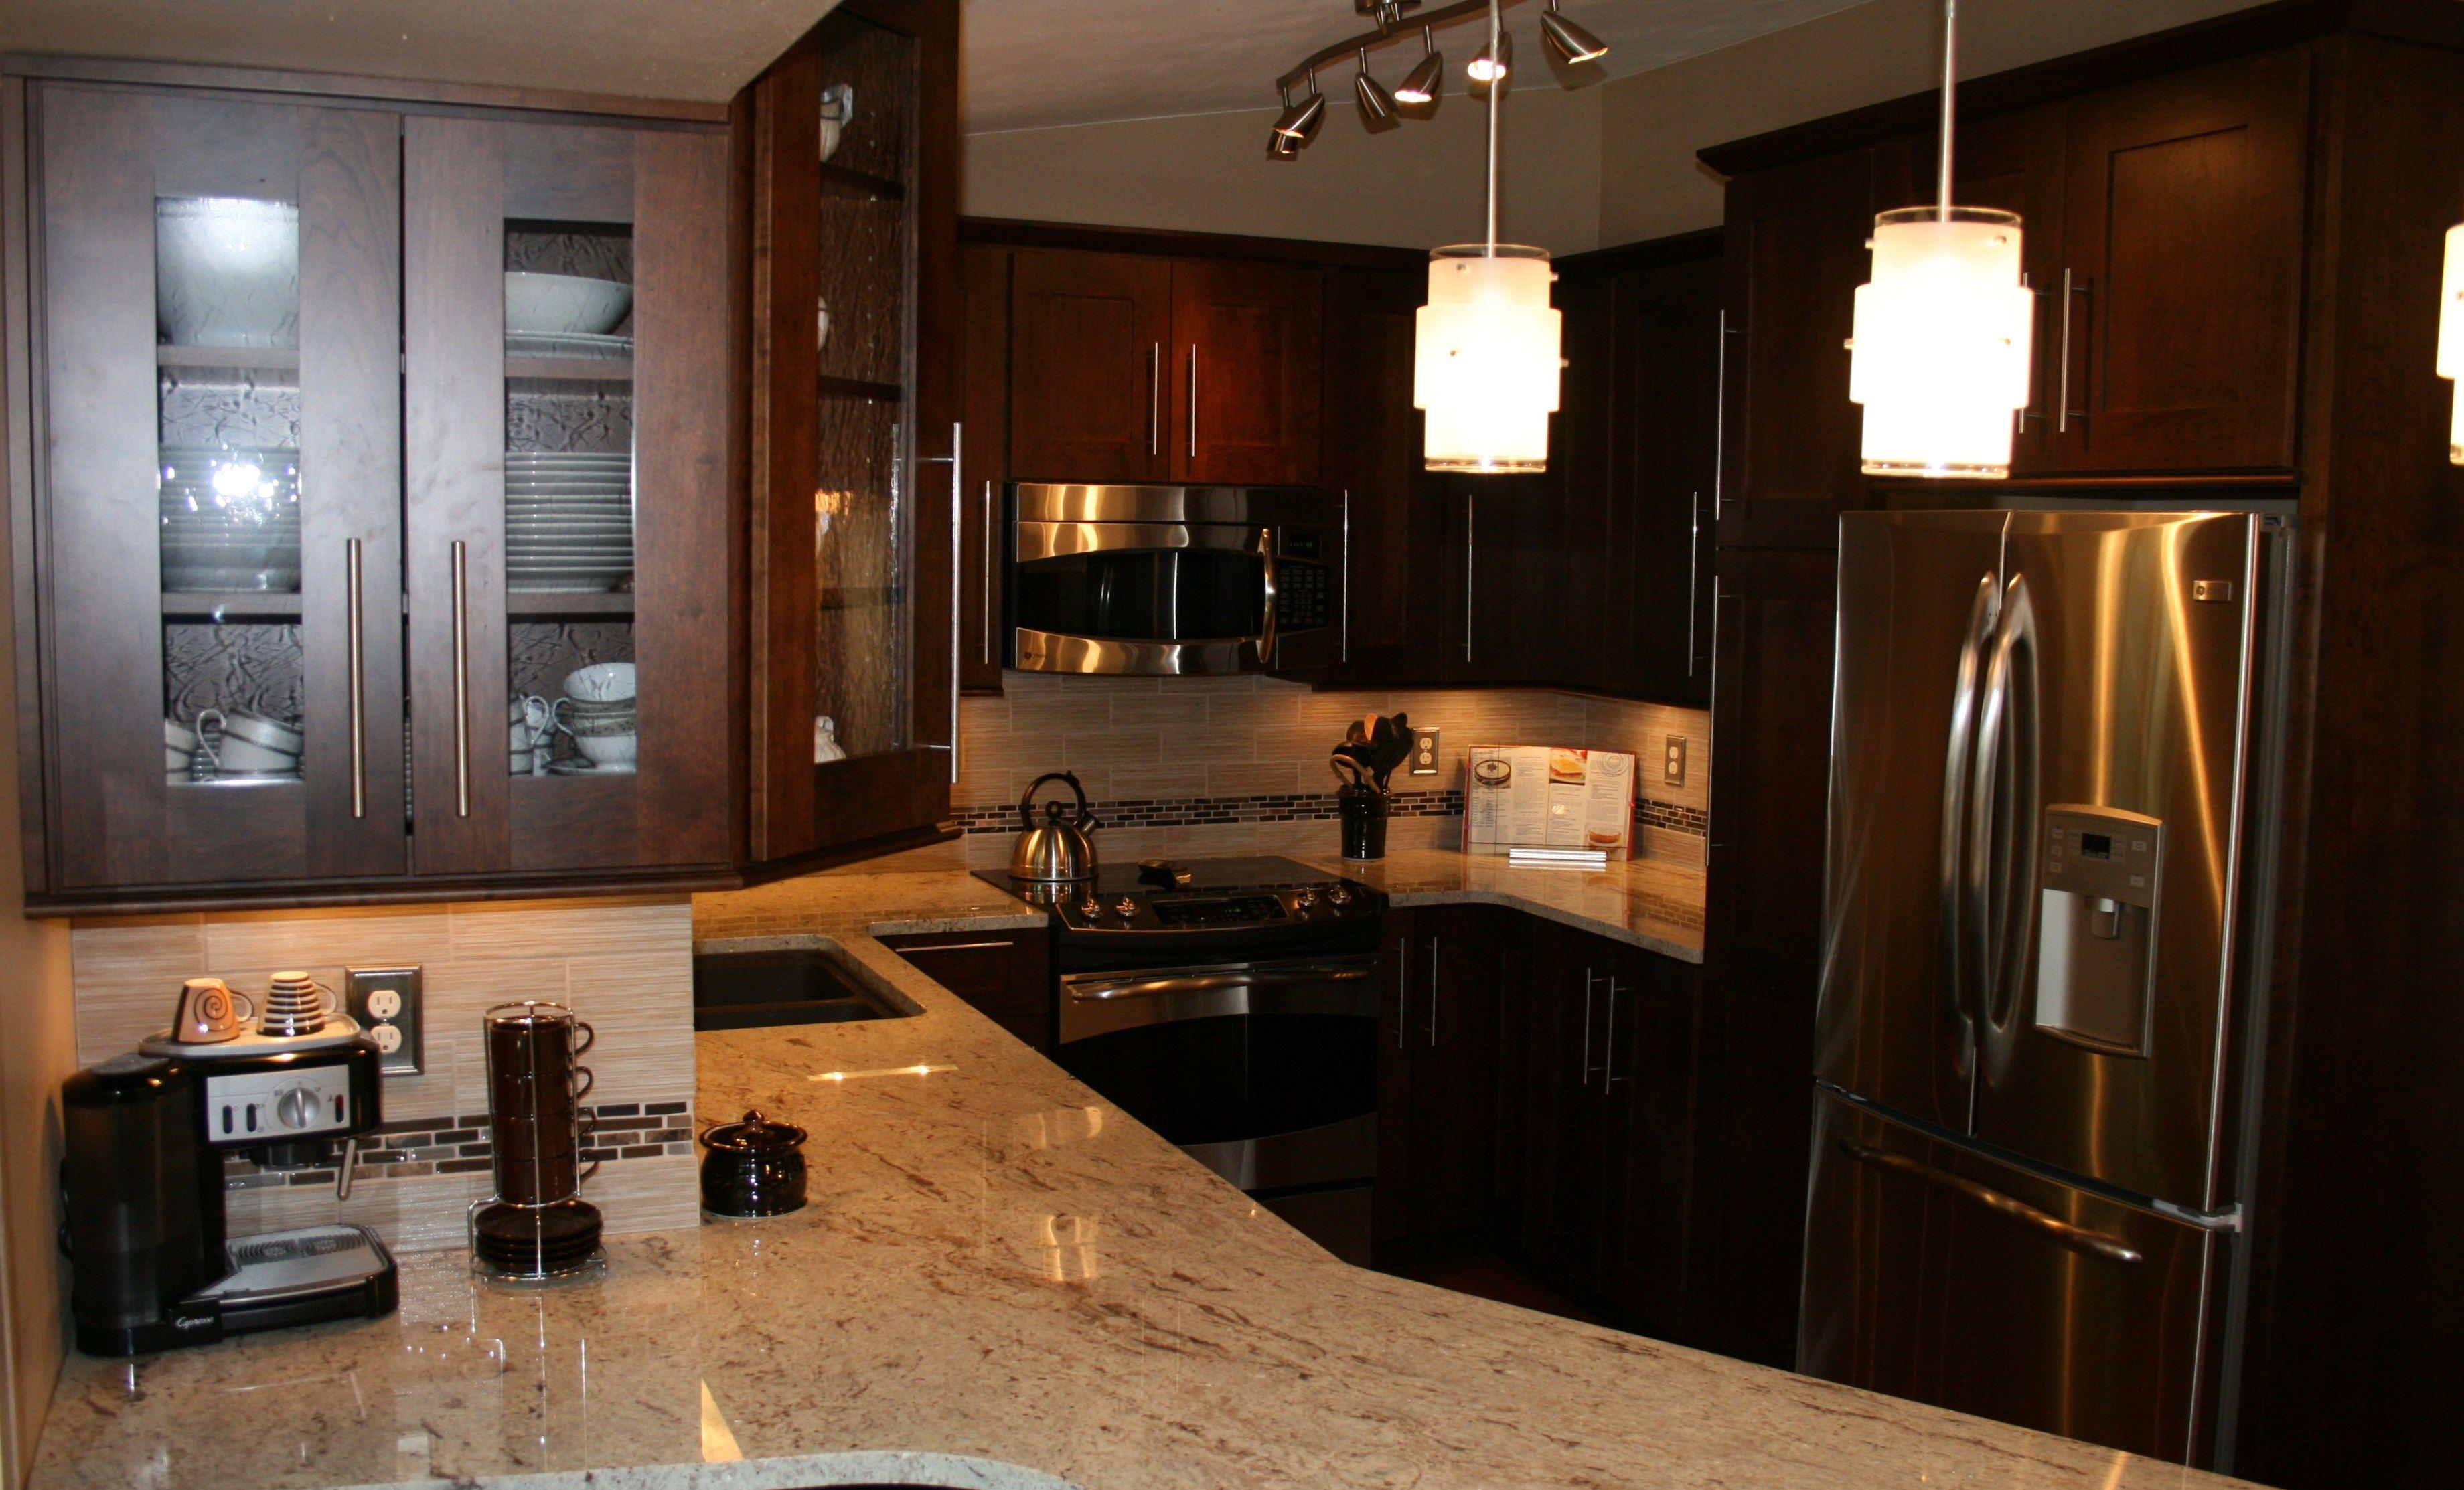 Dark Brown Cabinets with Light Granite Countertop | Dark ... on Black Granite Countertops With Brown Cabinets  id=47018